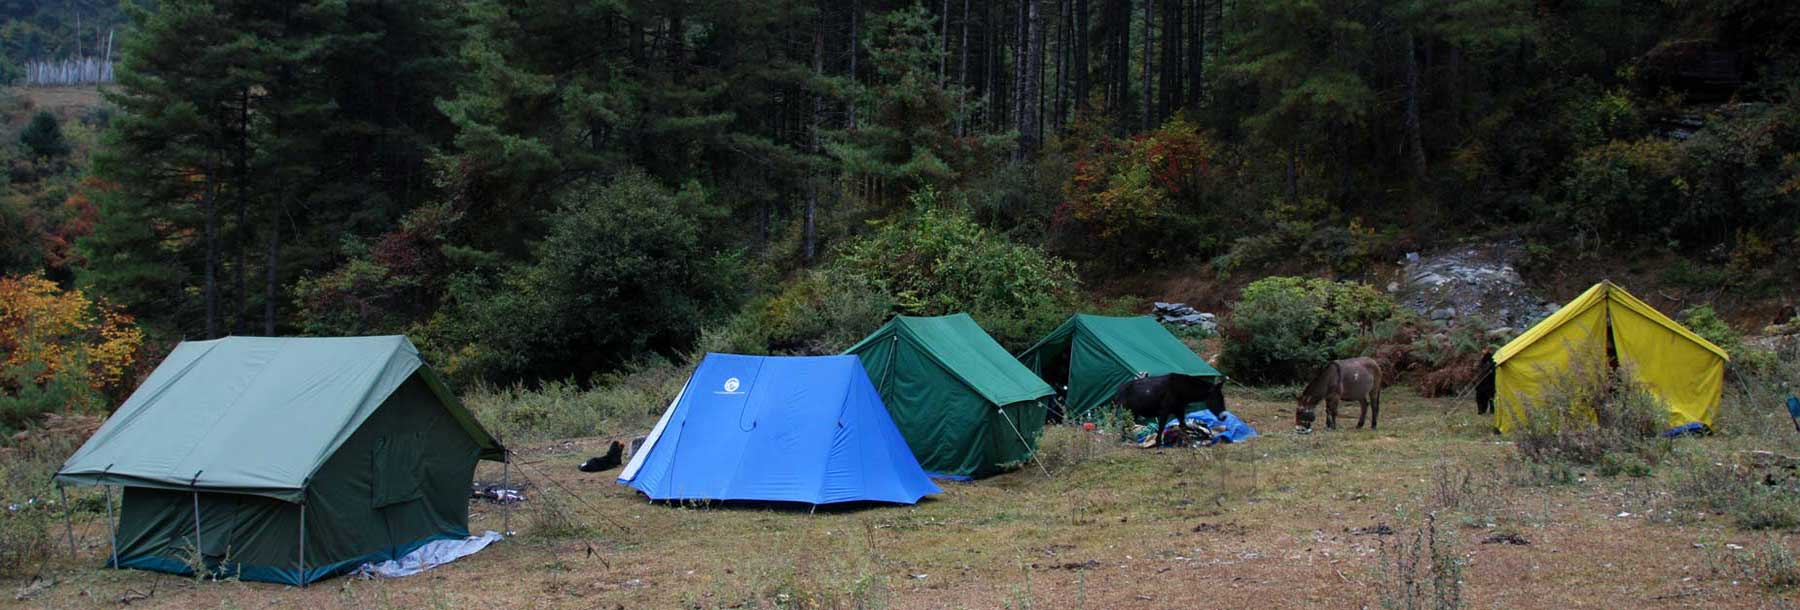 The last campsite of Druk Path Trek at an elevation of 3,750 meters above Thimphu